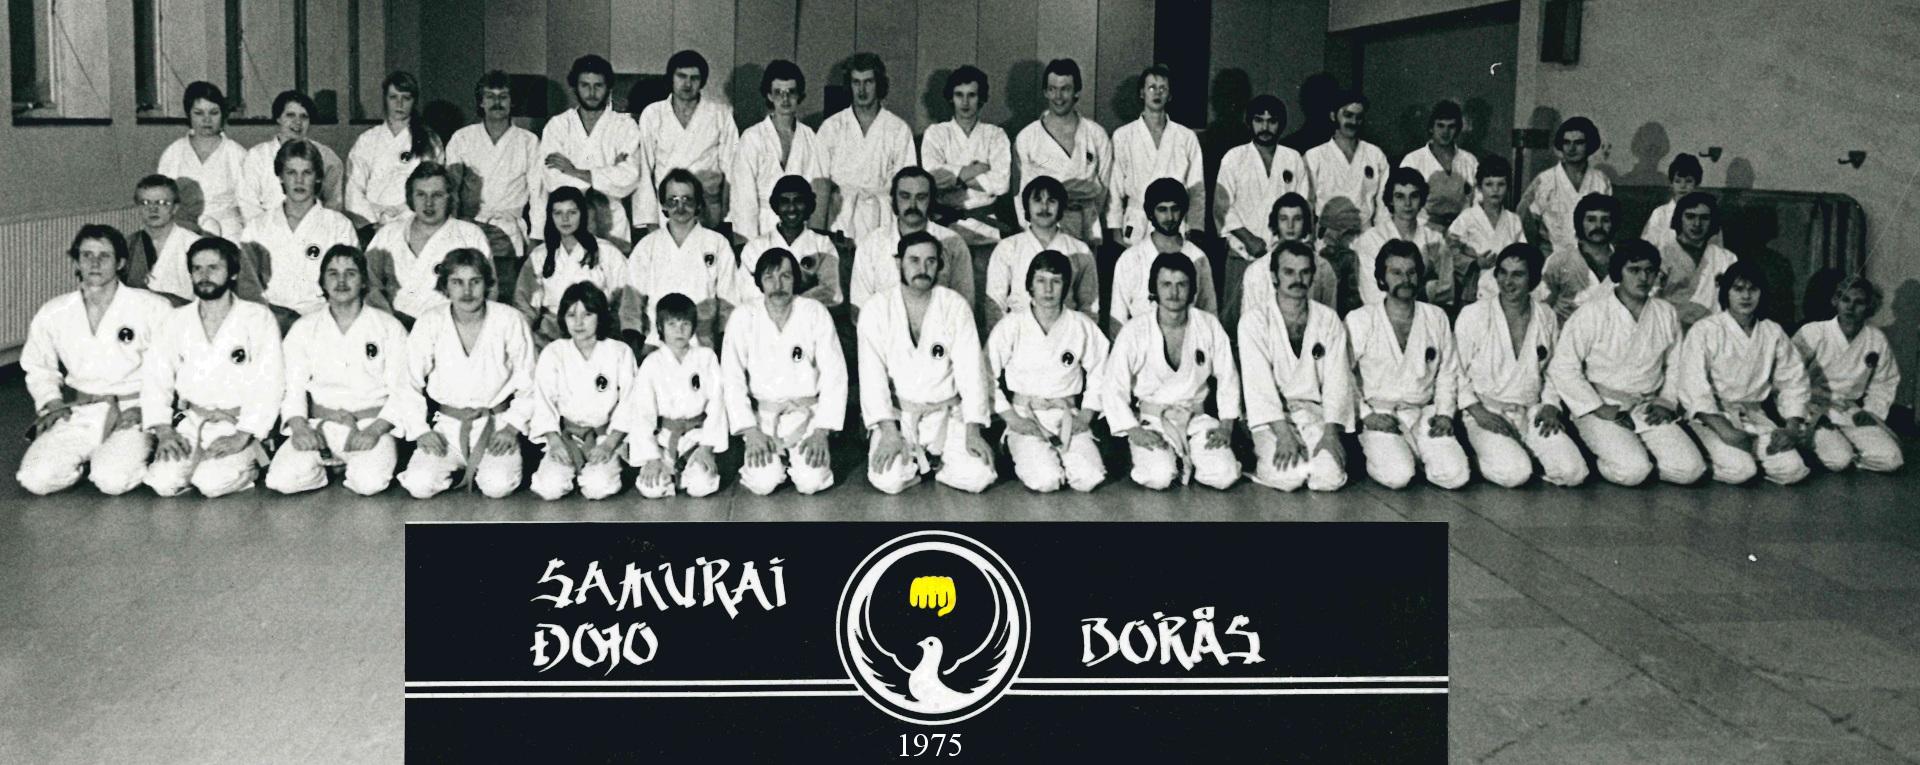 BKK-1975